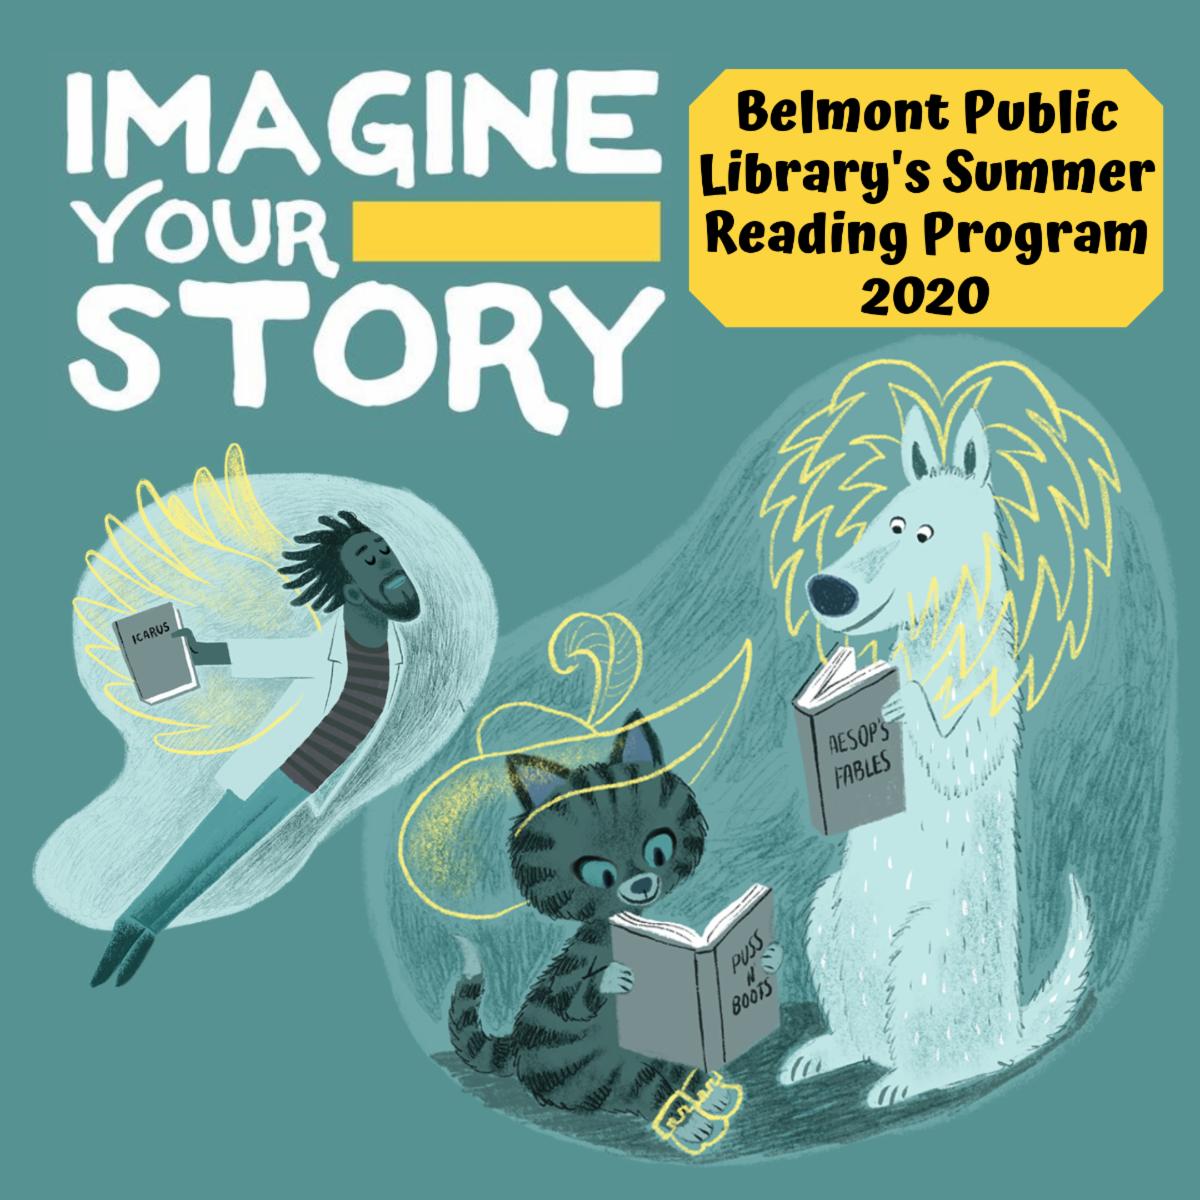 Imagine Your Story: Belmont Public Library's Summer Reading Program 2020